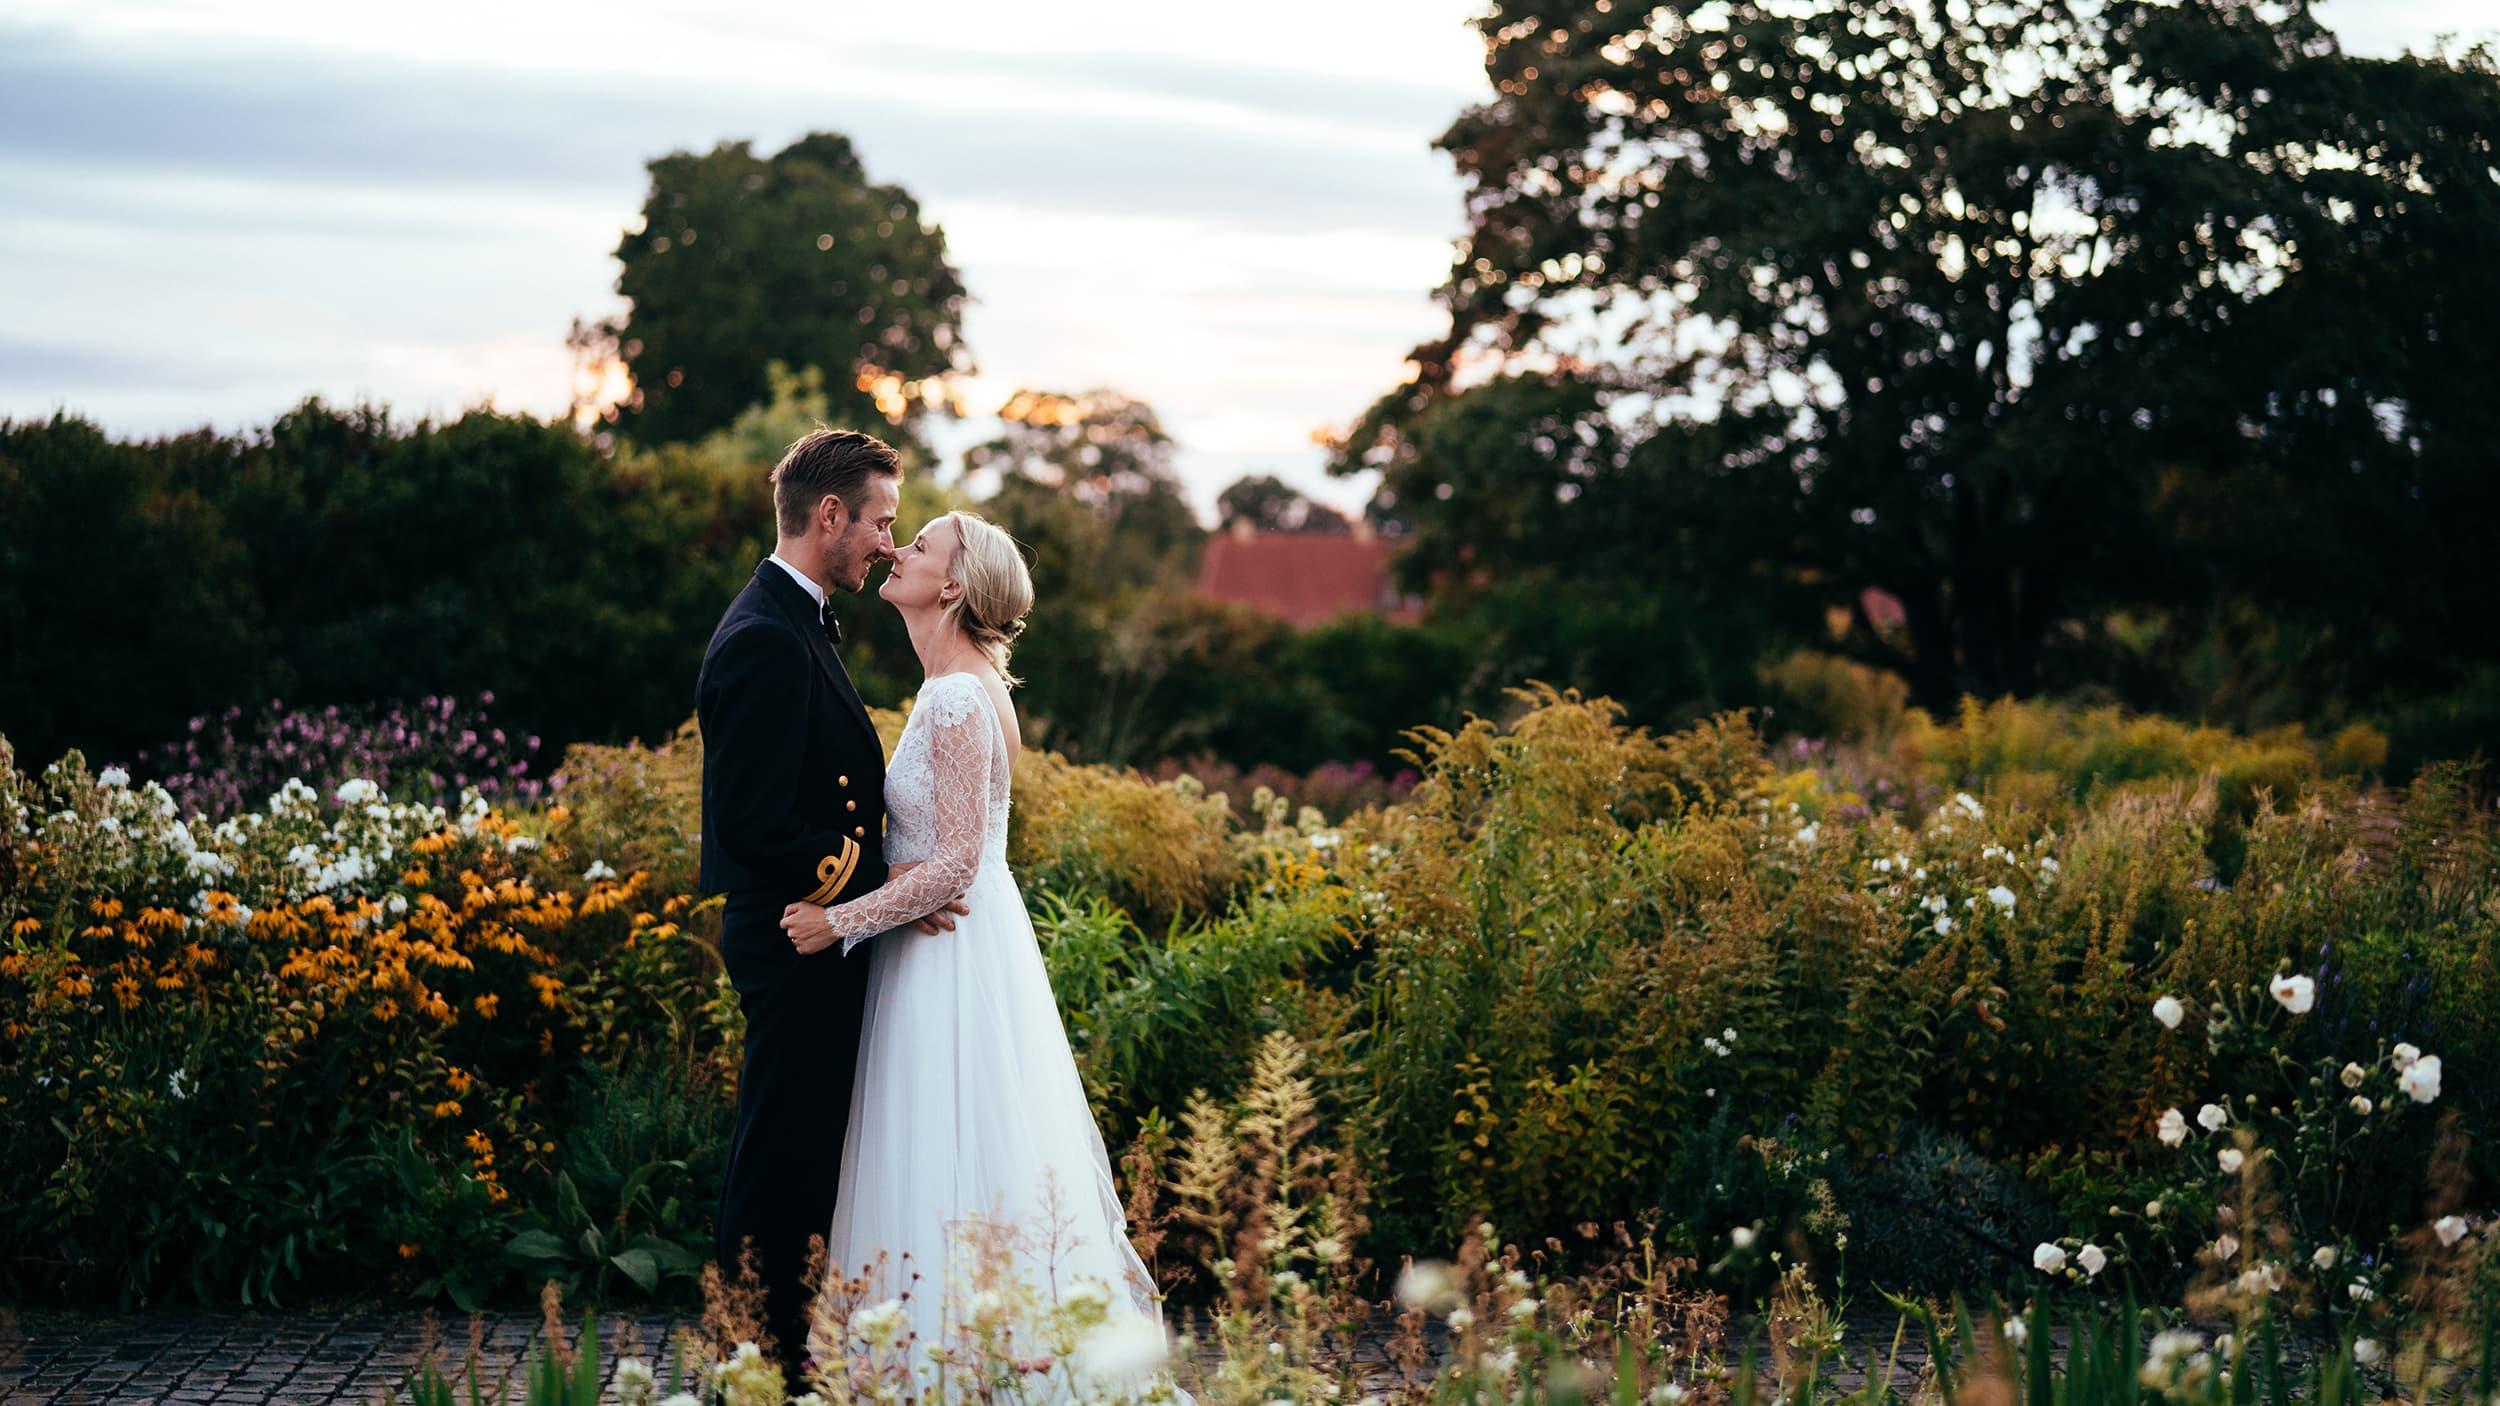 bryllupsfotograf-ved-langelinie-billede-af-brudepar.jpg